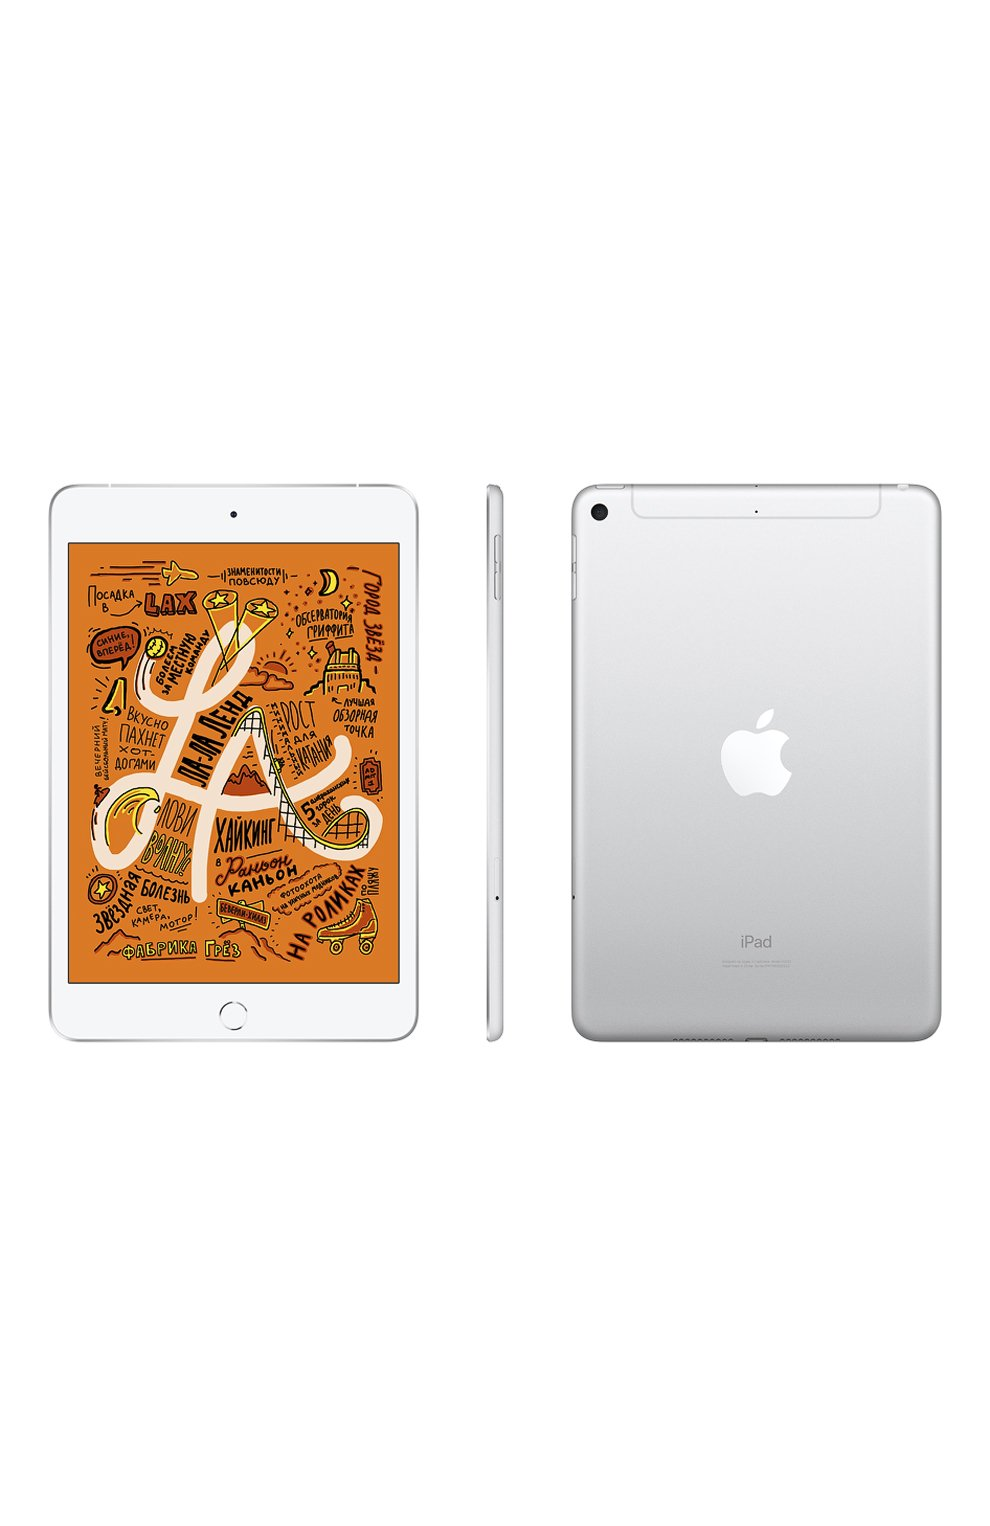 Ipad mini wi-fi + cellular 256gb silver APPLE  silver цвета, арт. MUXD2RU/A   Фото 2